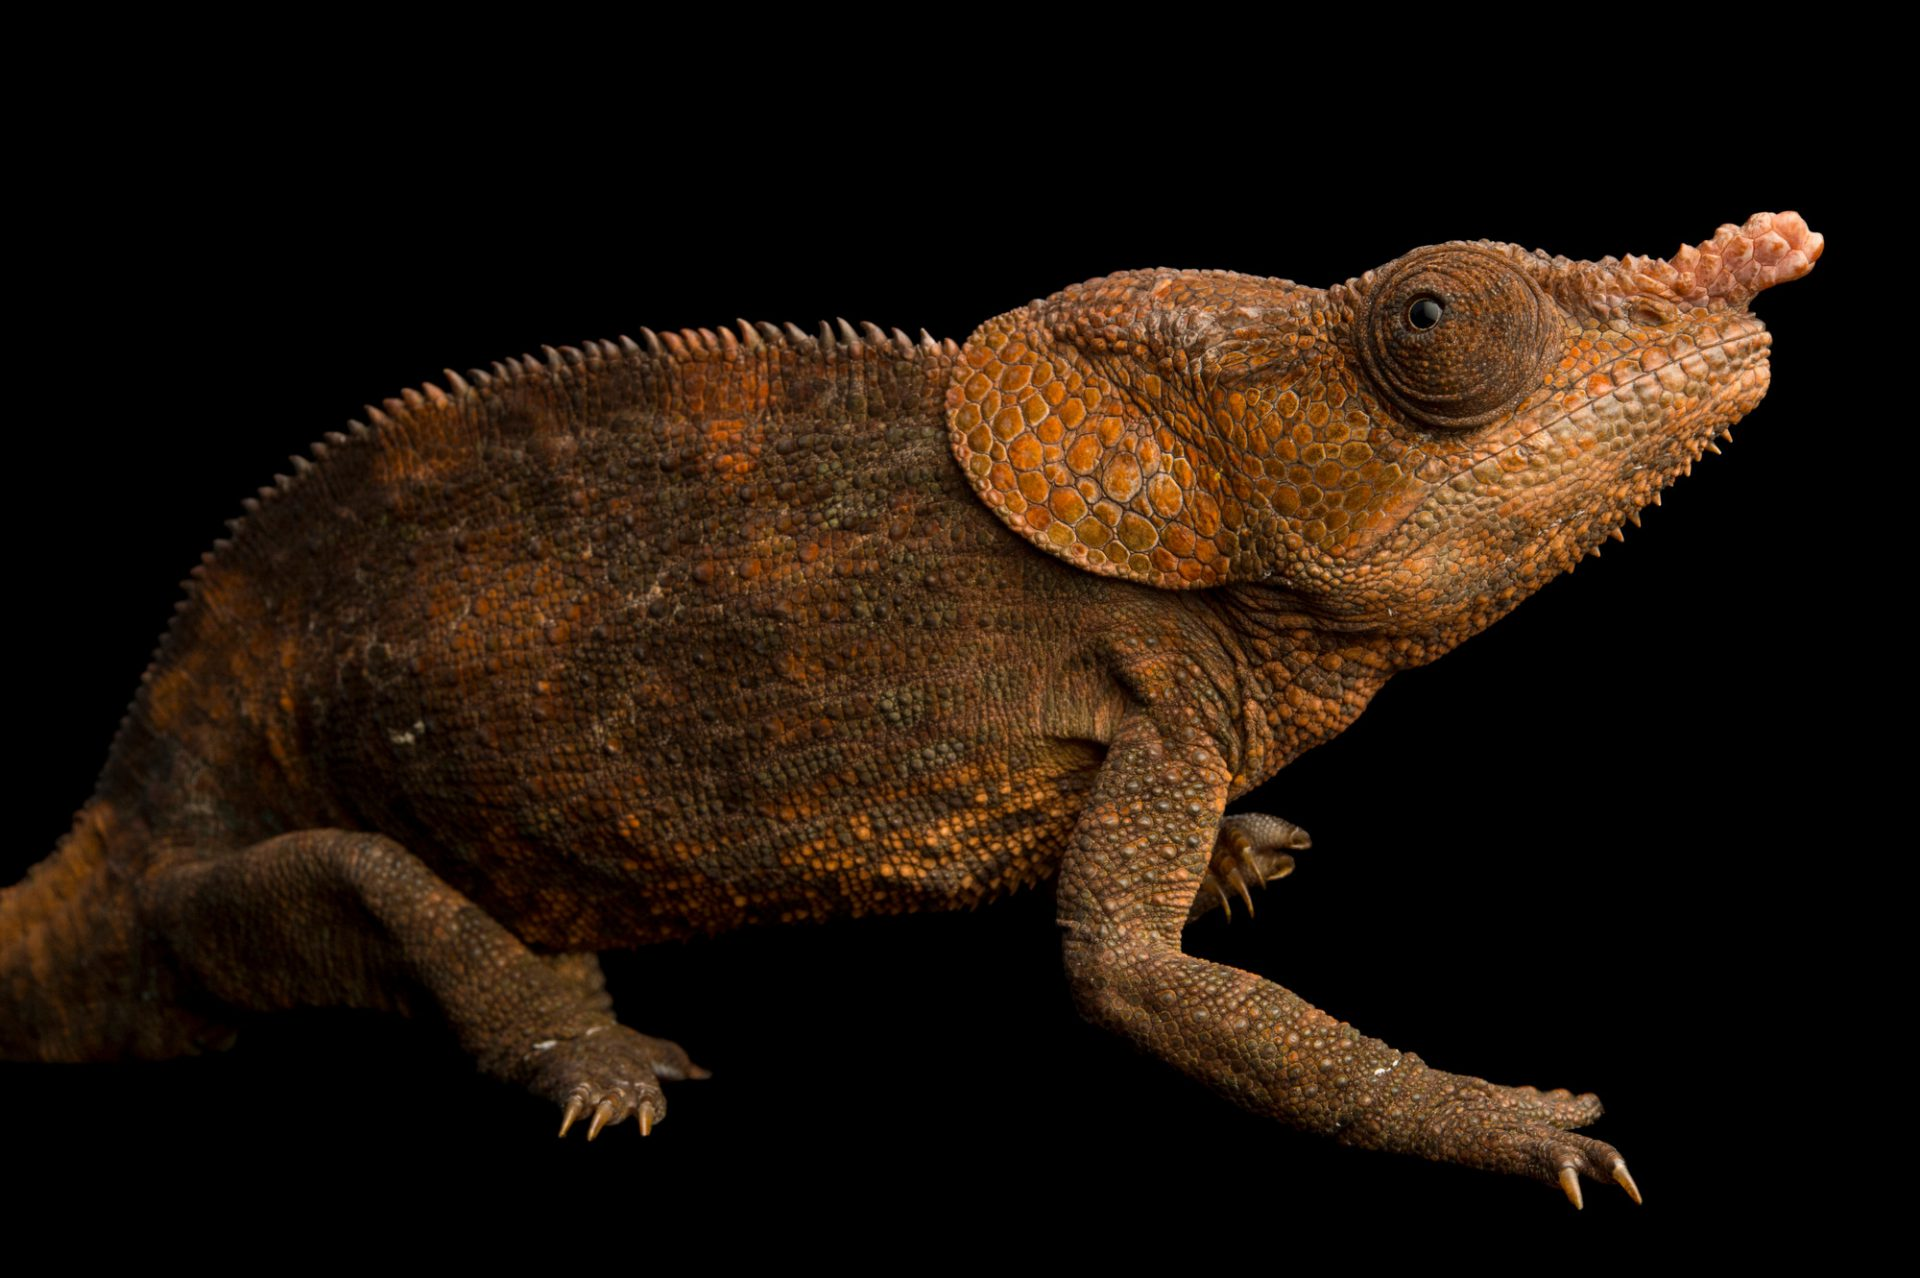 Photo: Elephant-eared chameleon (Calumma brevicornis) near Lemuria Land, Madagascar.